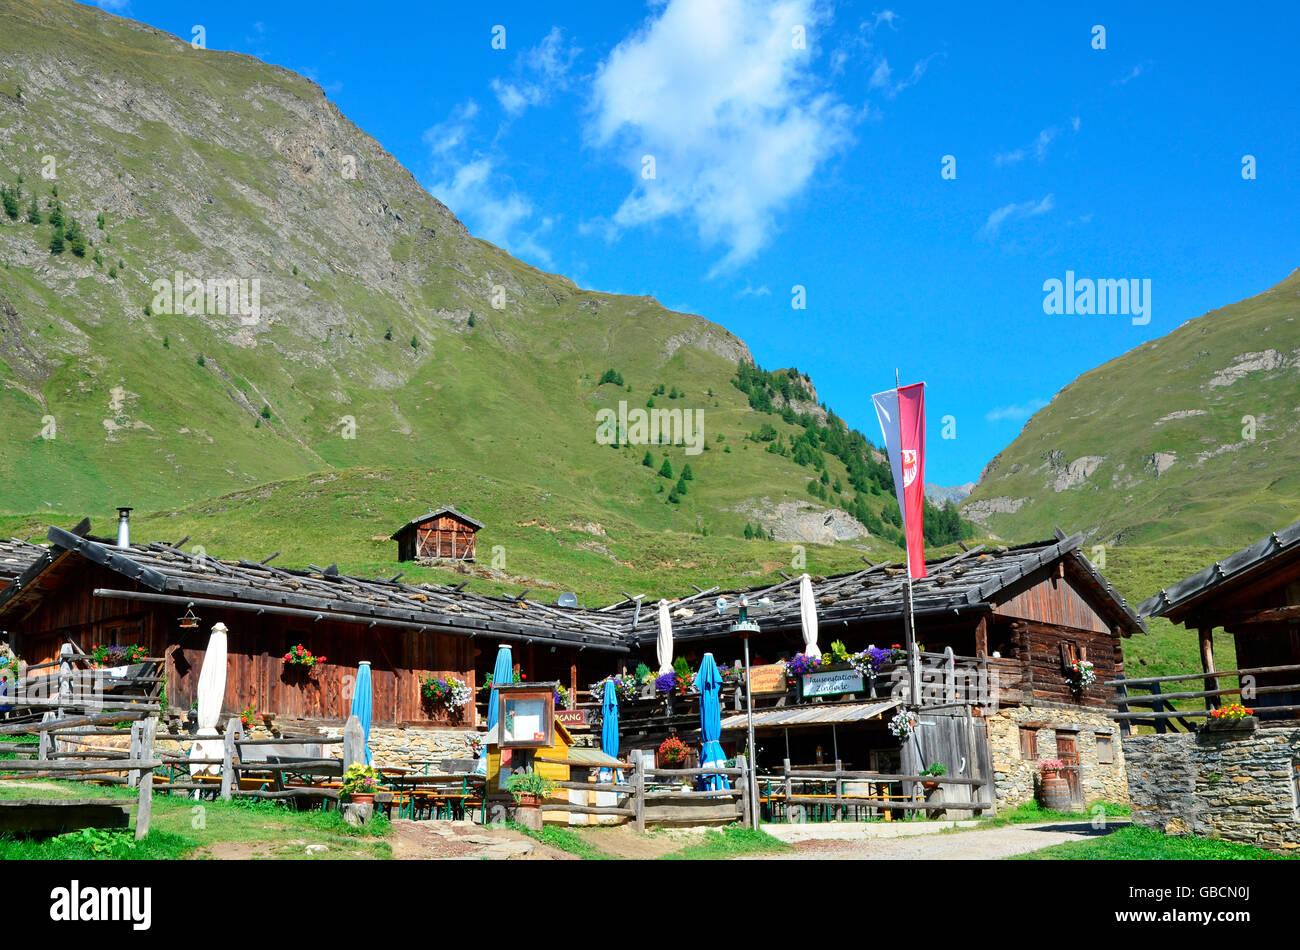 Landidyllle, Sommer, Almhuette, Alm, Almdorf, Fane Alm, Pustertal, Suedtirol, Italien Banque D'Images